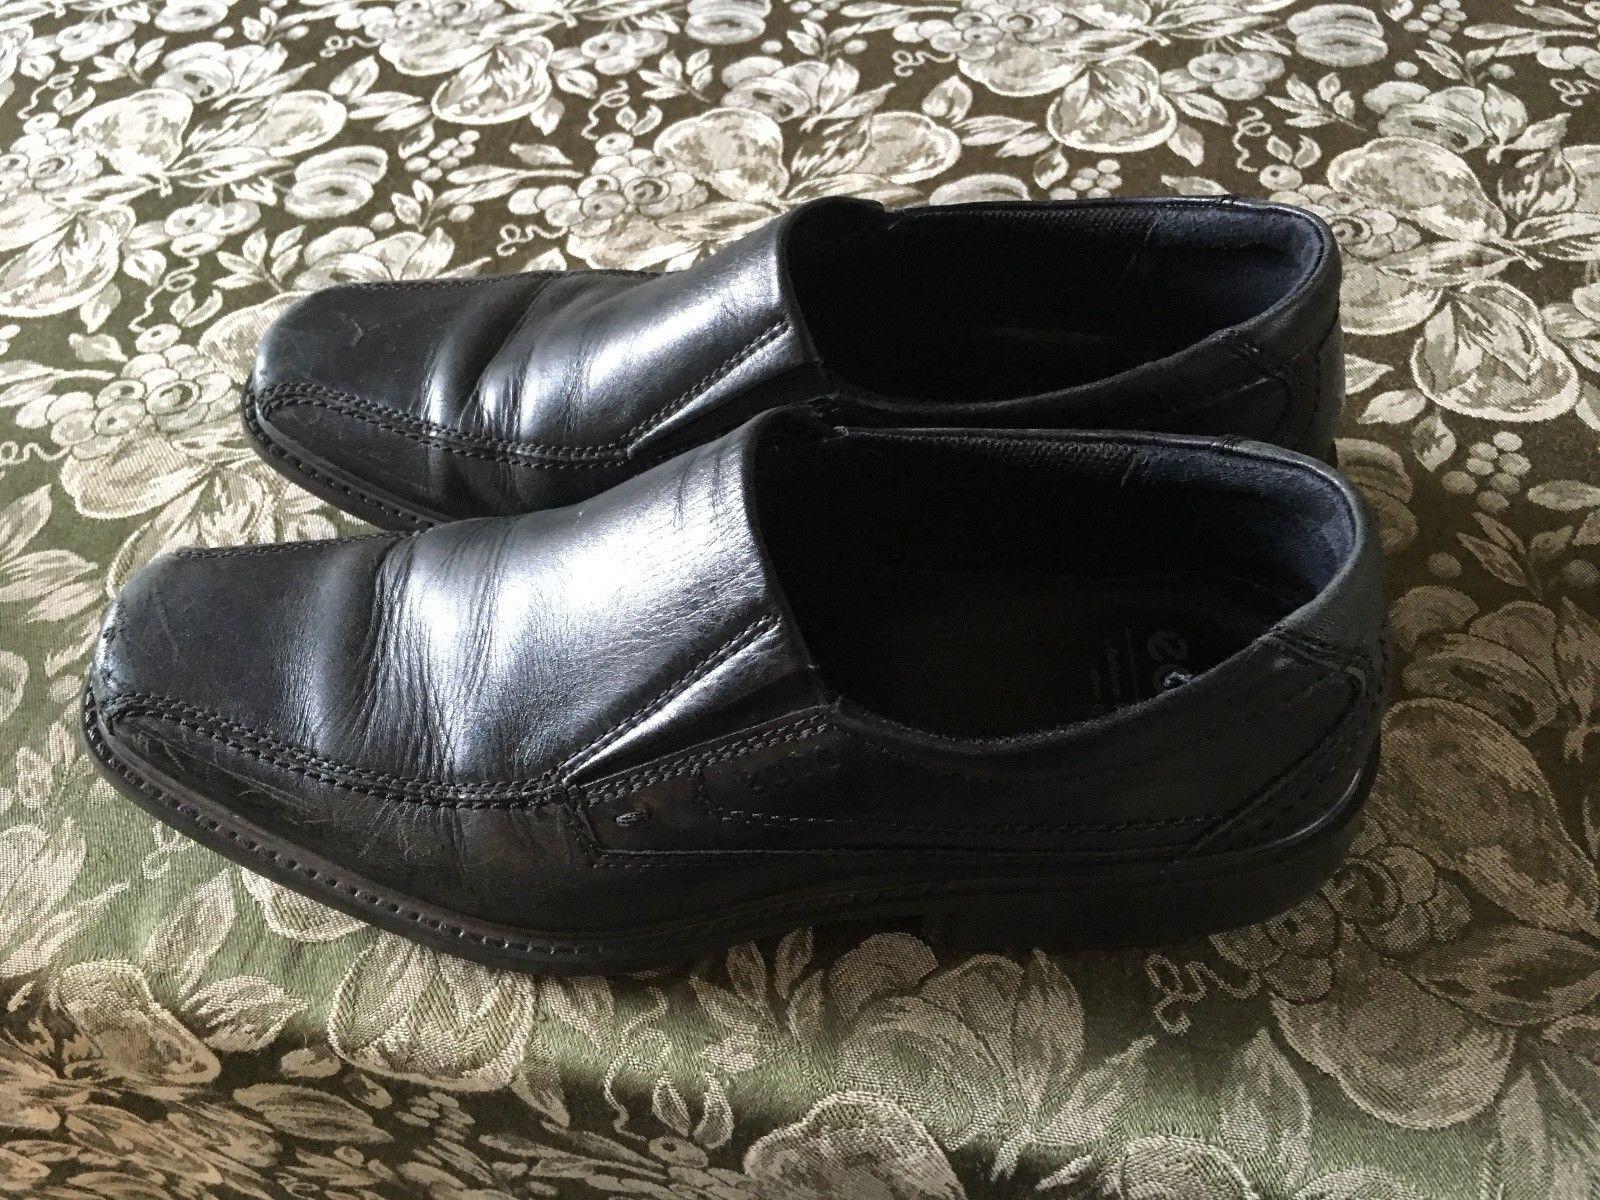 ECCO Men's Black Leather Comfort Slip On Walking Shoe